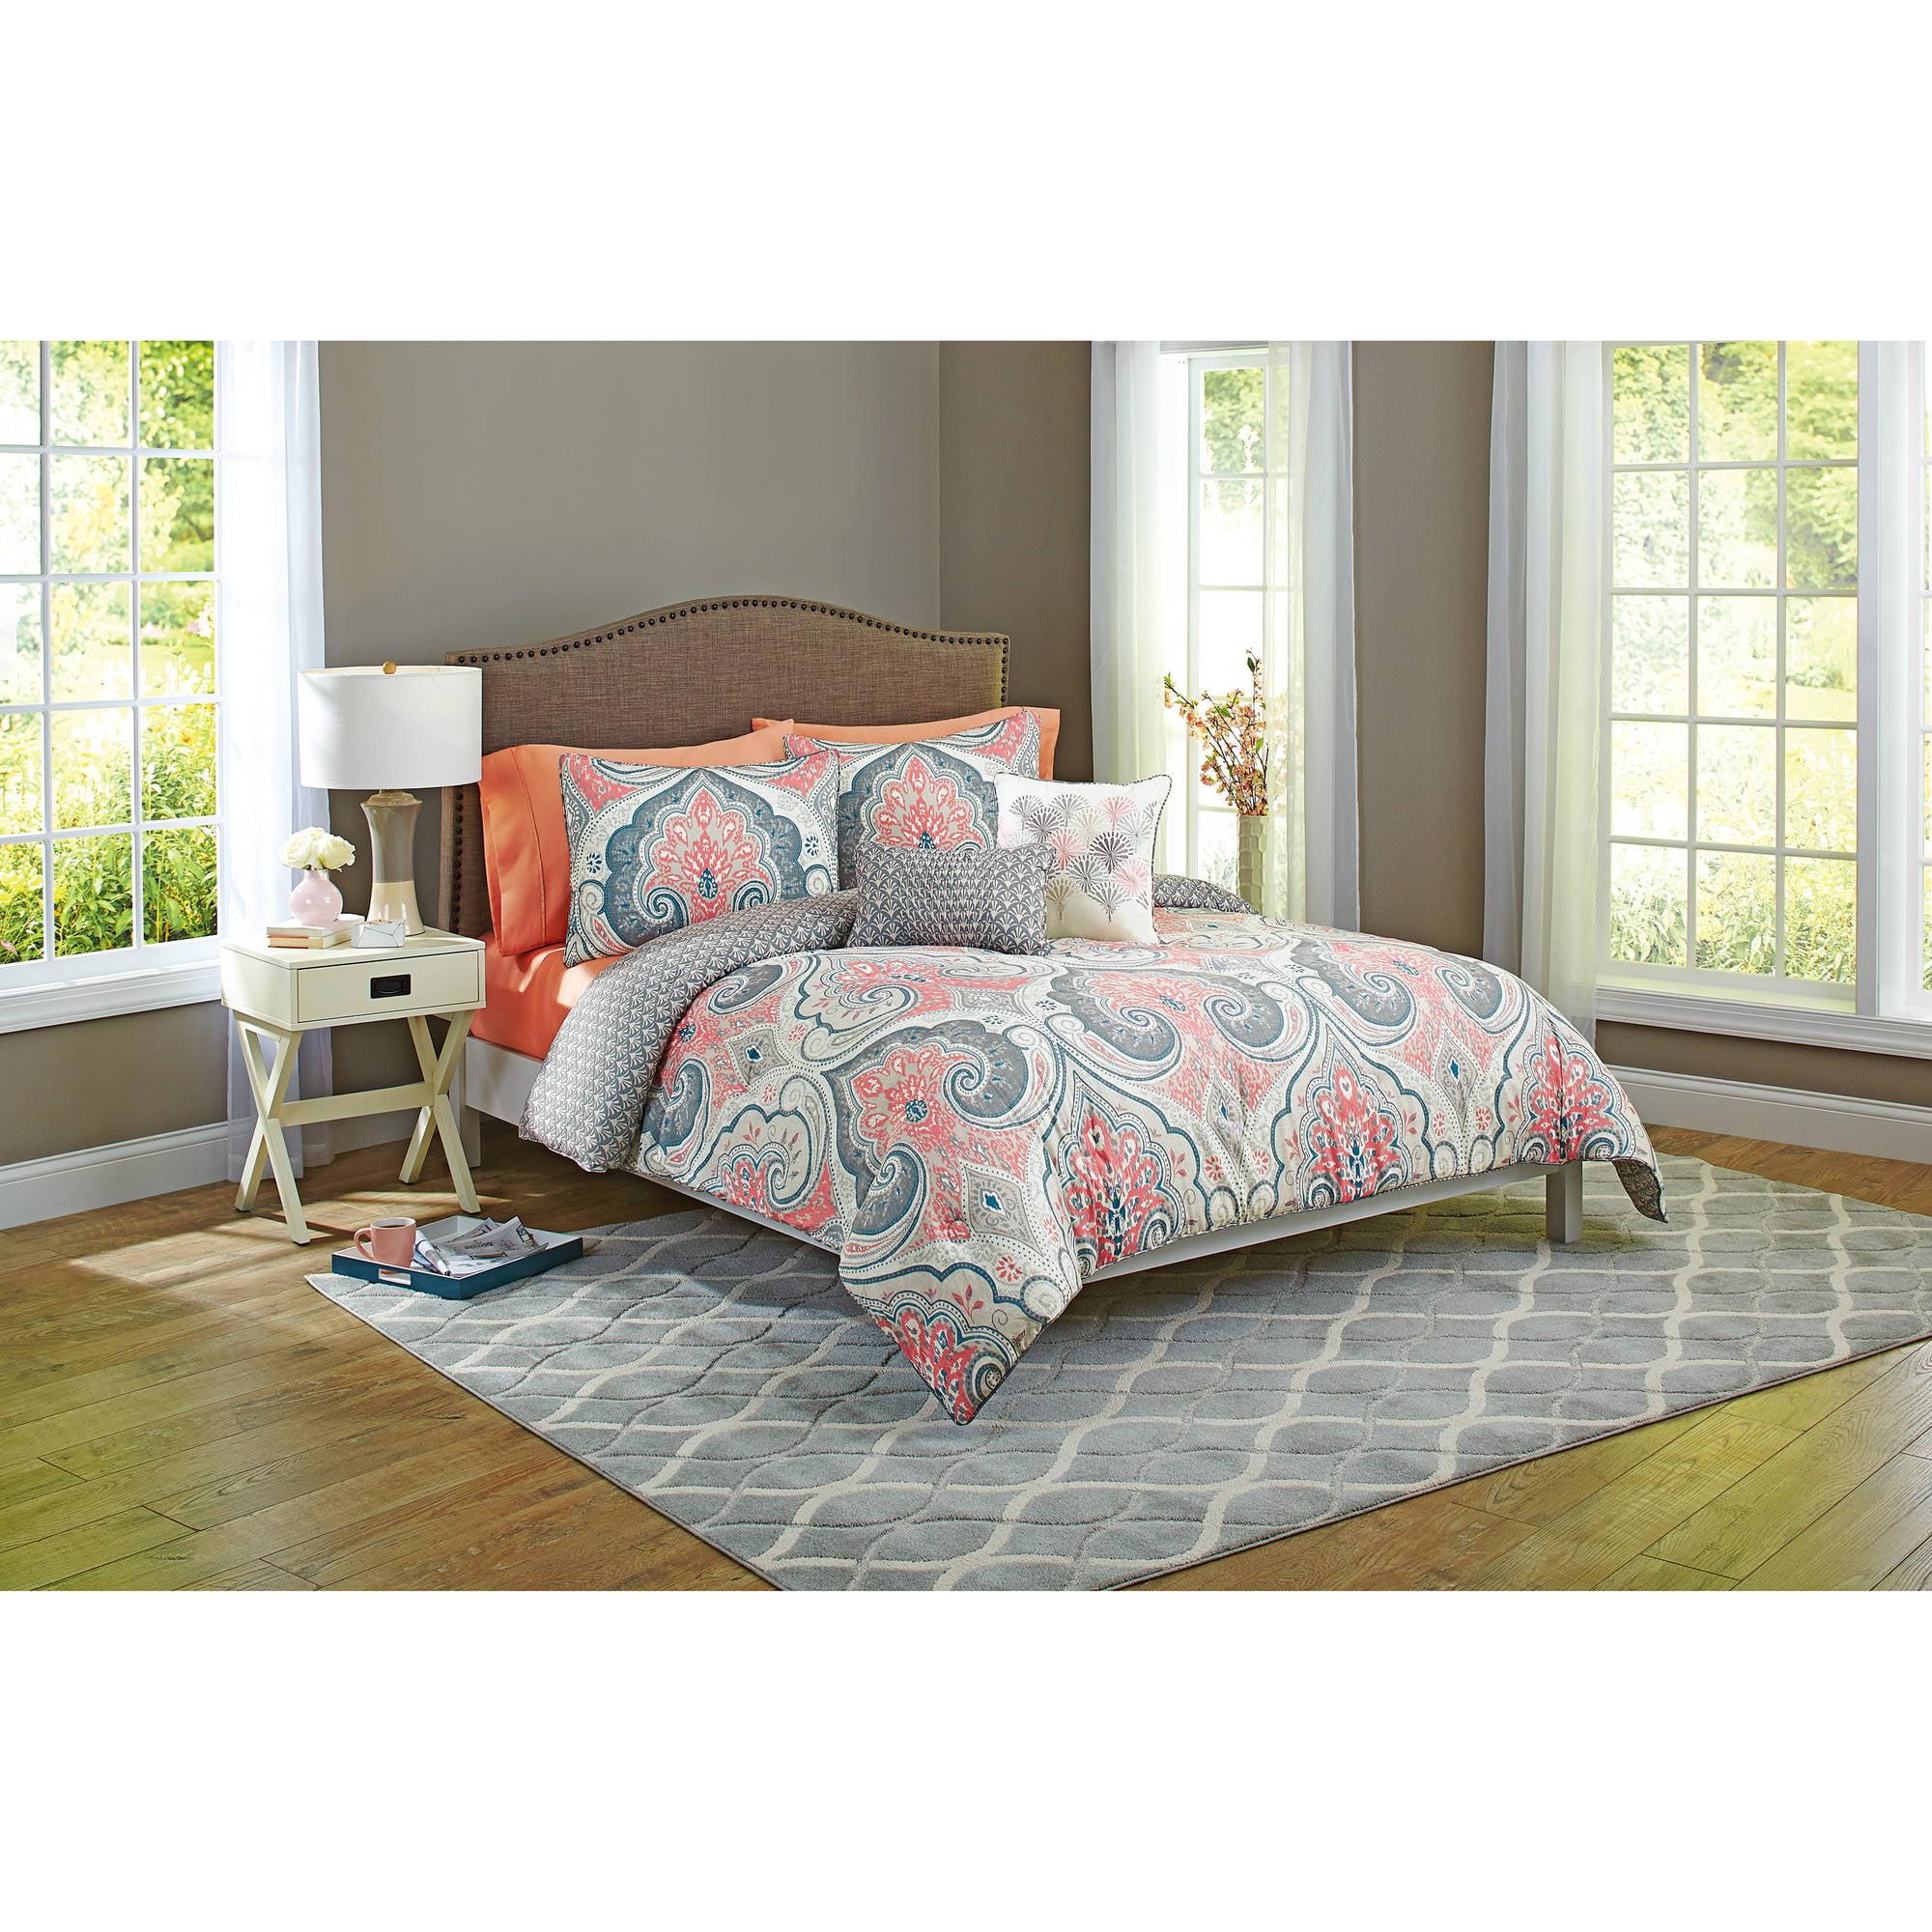 Better Home and Gardens Grey Medallion 5-Piece Bedding Comforter Set